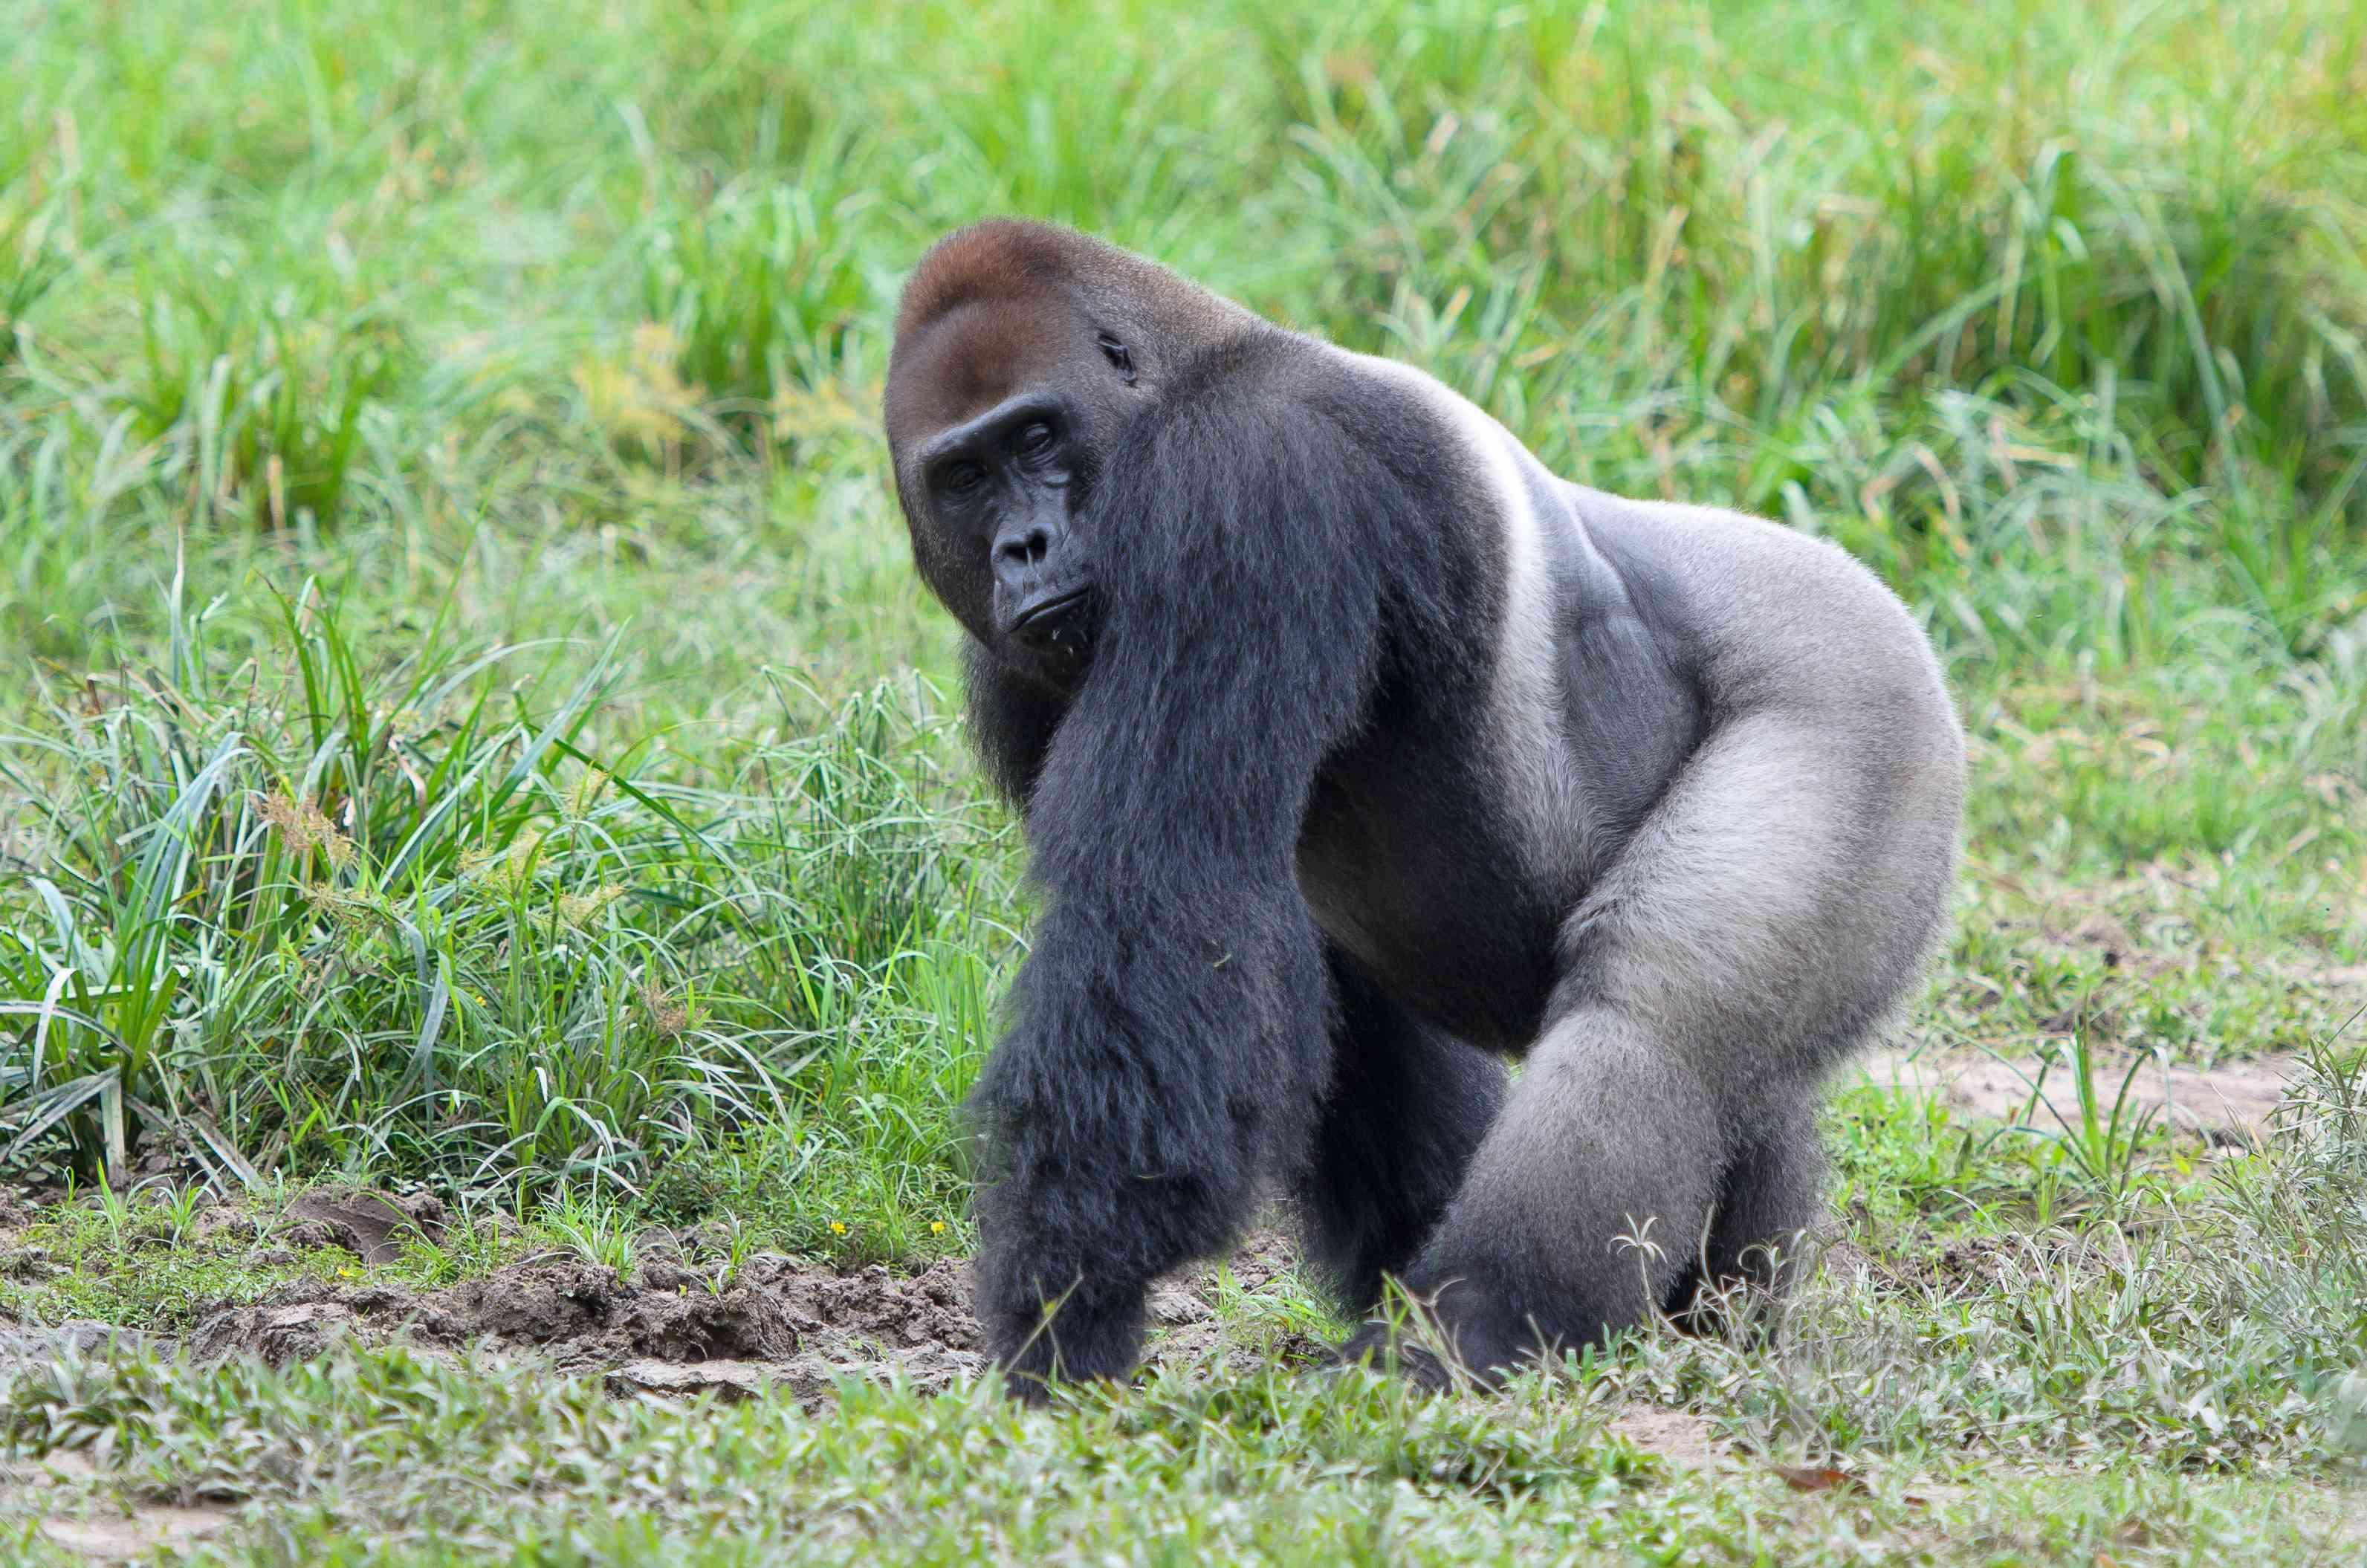 Portrait of western lowland gorilla (Gorilla gorilla gorilla), Bayanga, Central African Republic